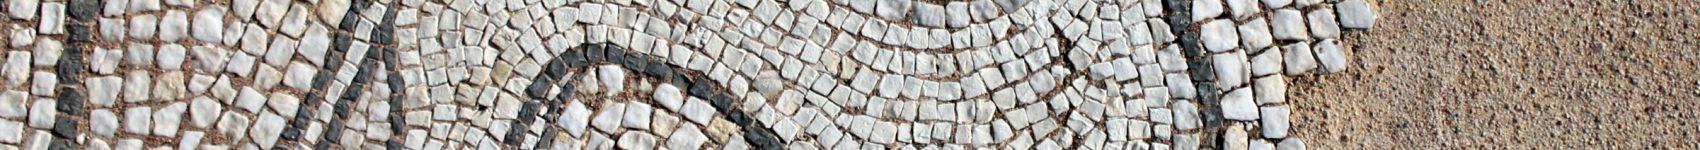 The early Christian mosaics of Delphi, Greece.